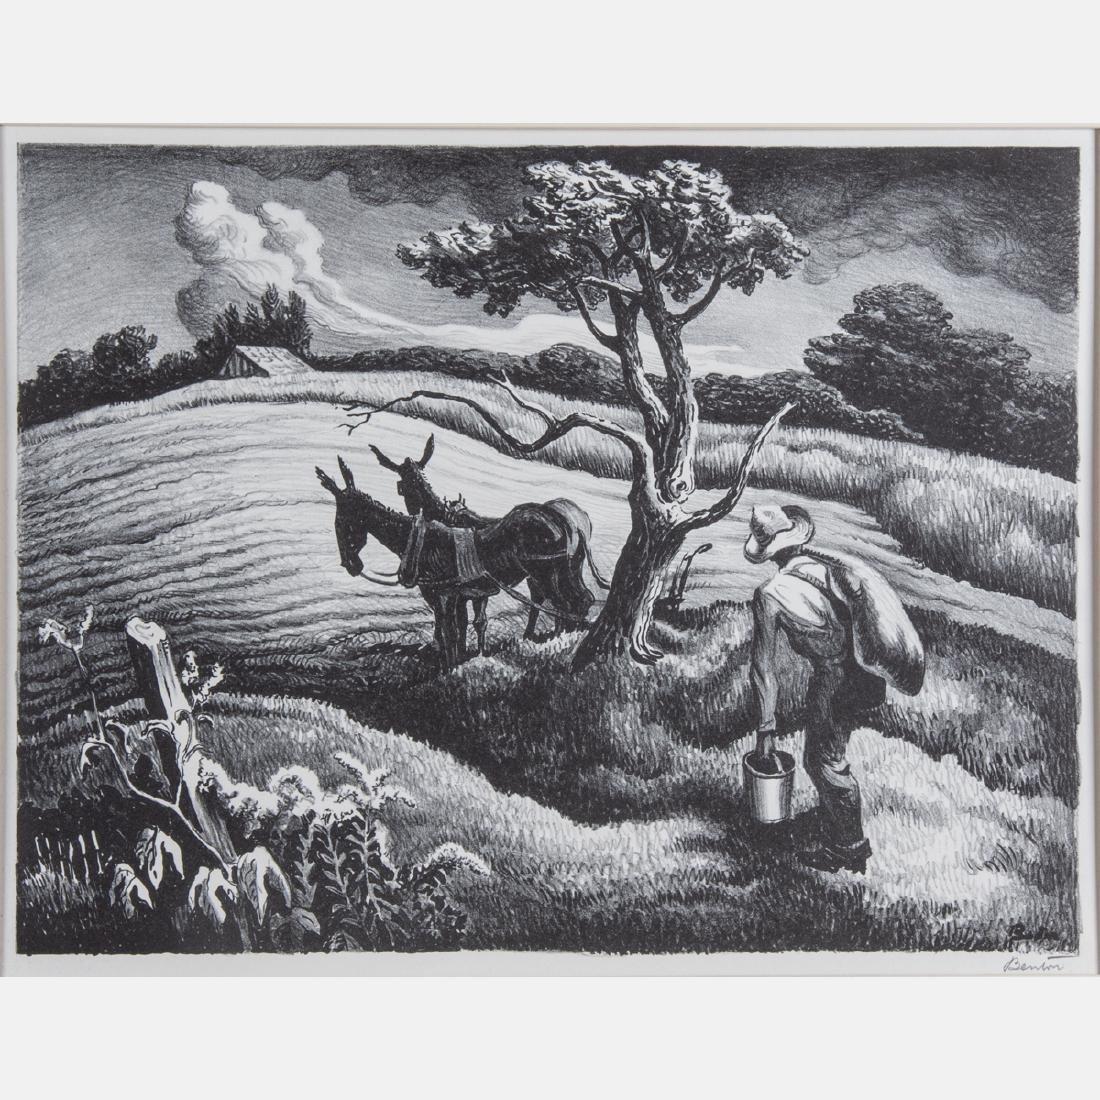 Thomas Hart Benton (1889-1975) Approaching Storm, 1938,